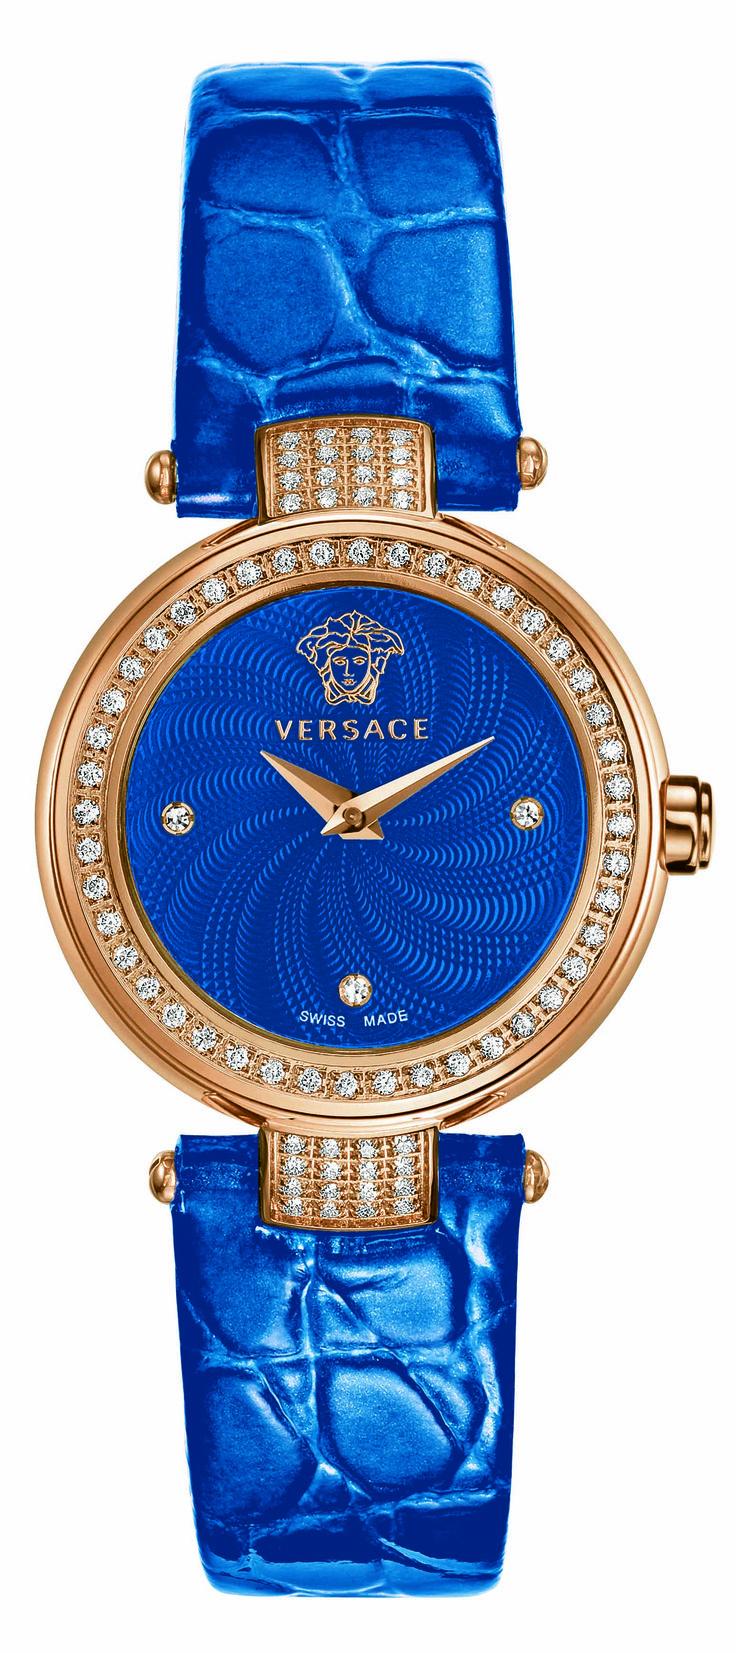 Versace Mystique Small: Blue Versace, Fashion, Cobalt Blue, Jewelry, Royal Blue, Versace Mystique, Watches, Versace Watch